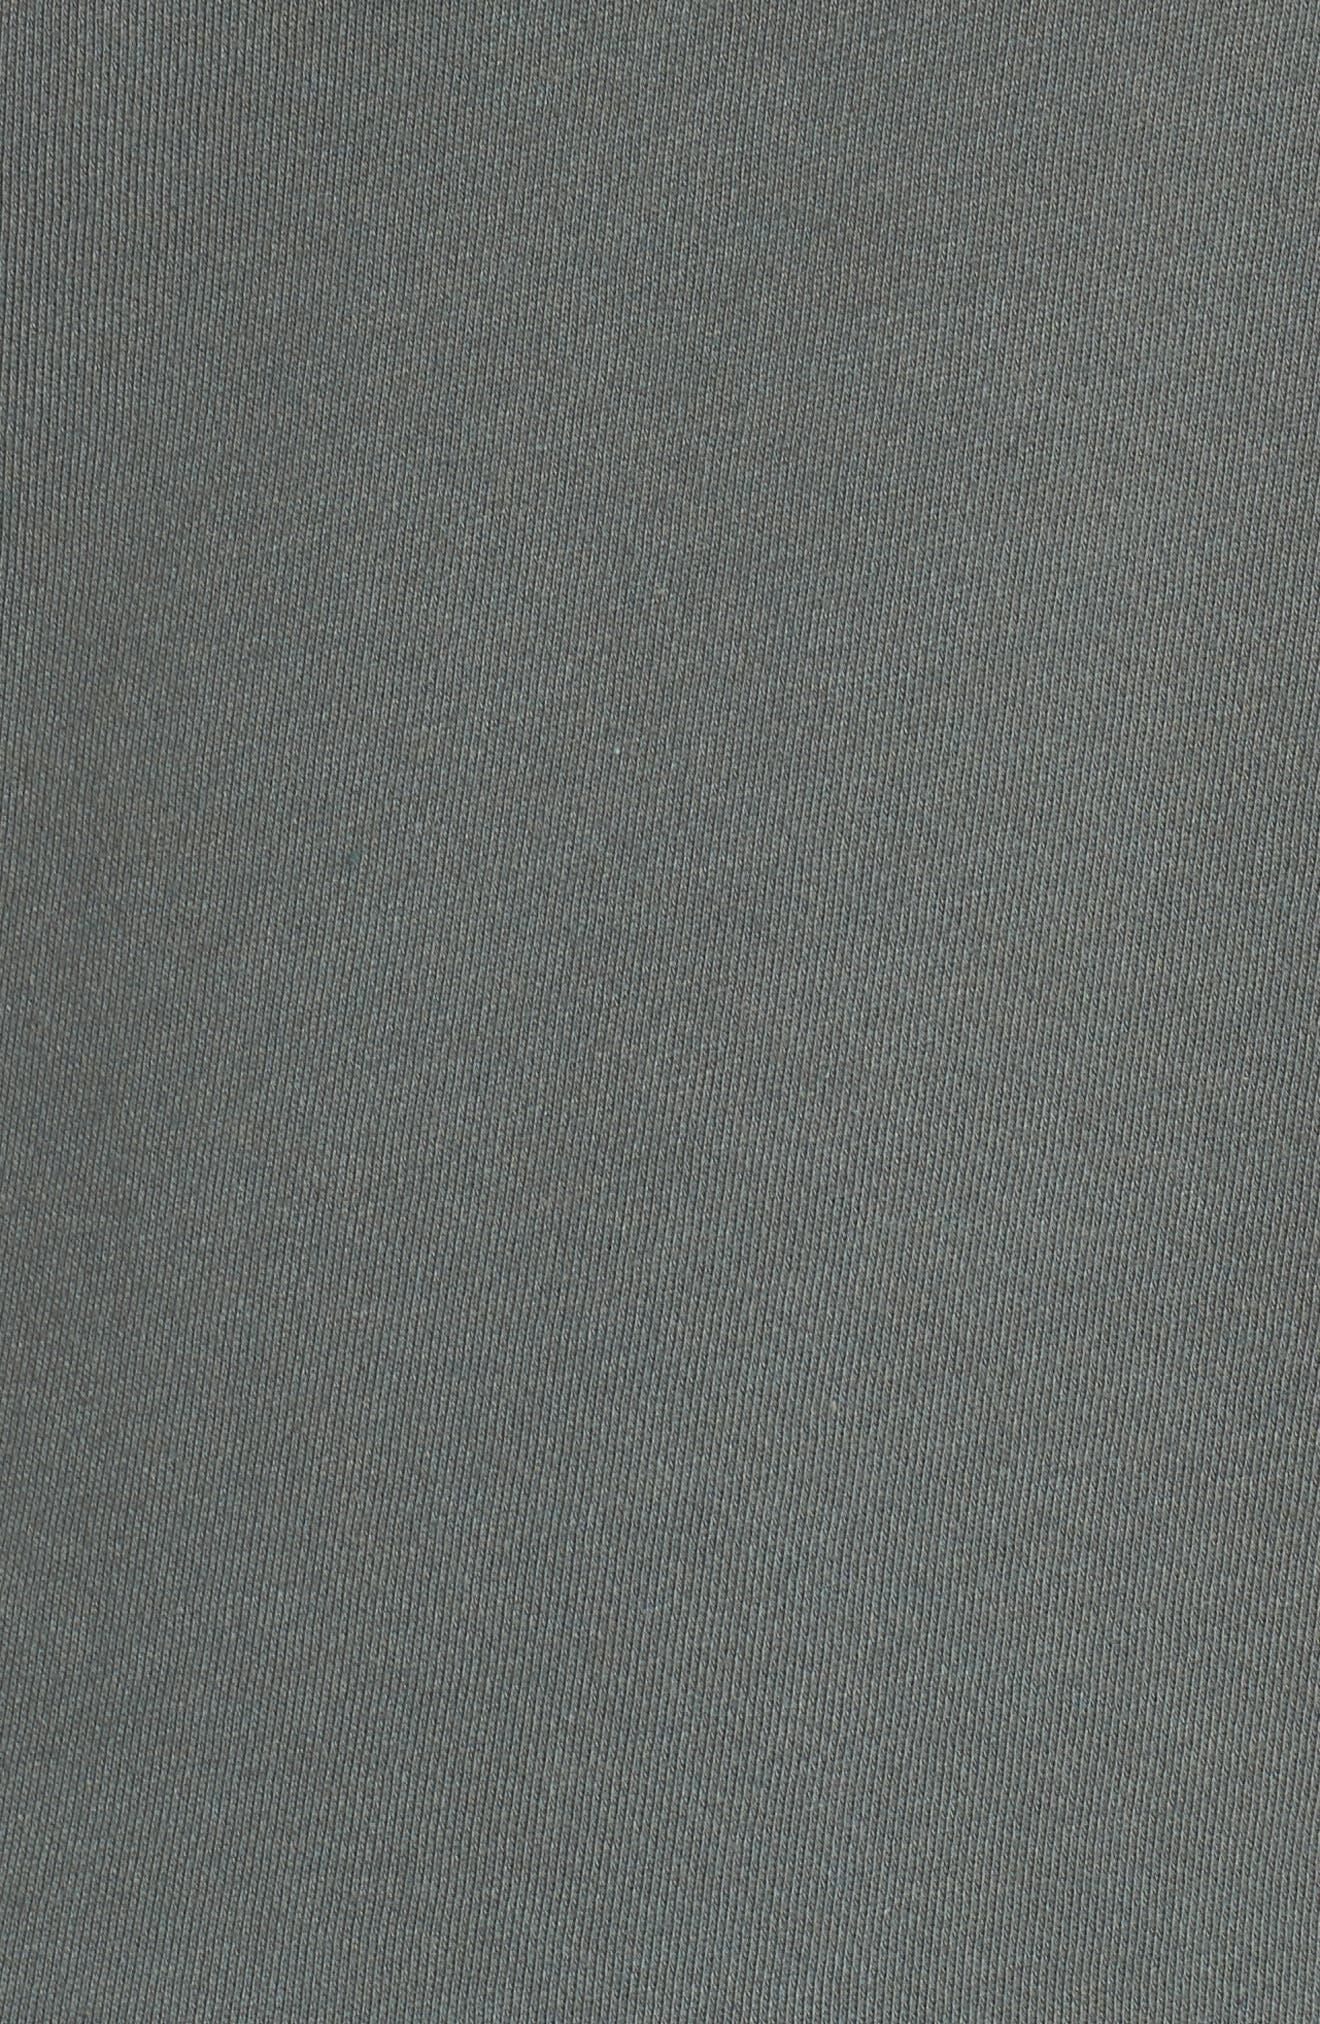 Boxy Oversize Sweatshirt,                             Alternate thumbnail 15, color,